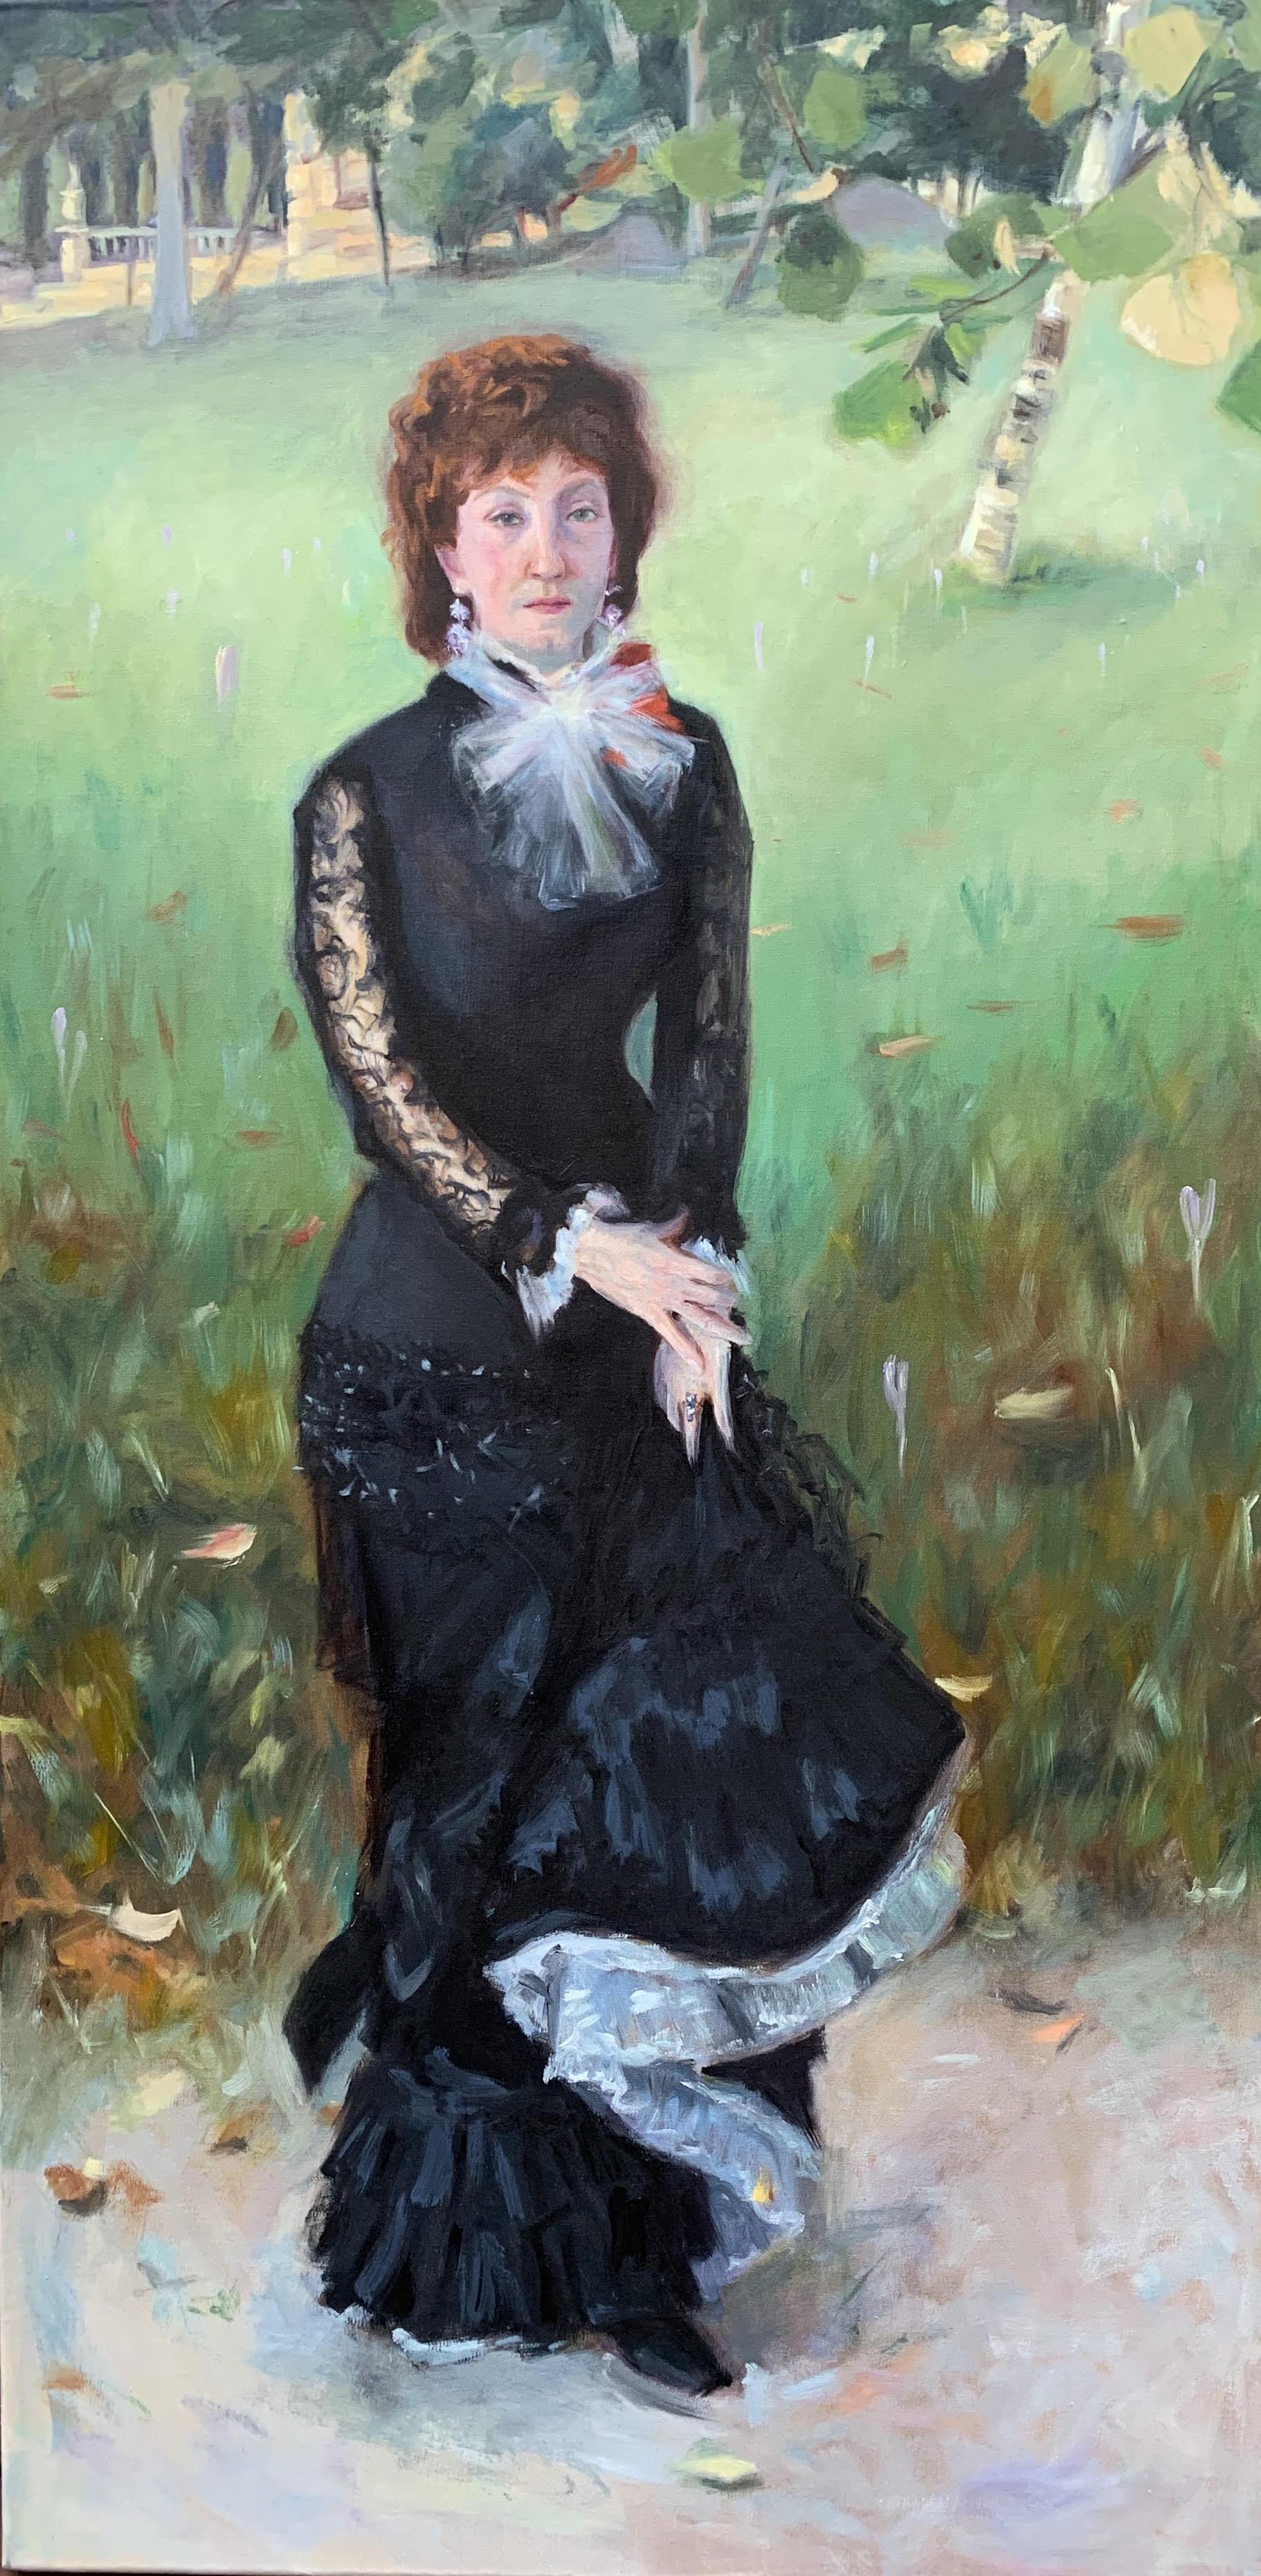 Copy of John Singer Sargent's Marie Buloz Pailleron (Madame Edouard Pailleron)